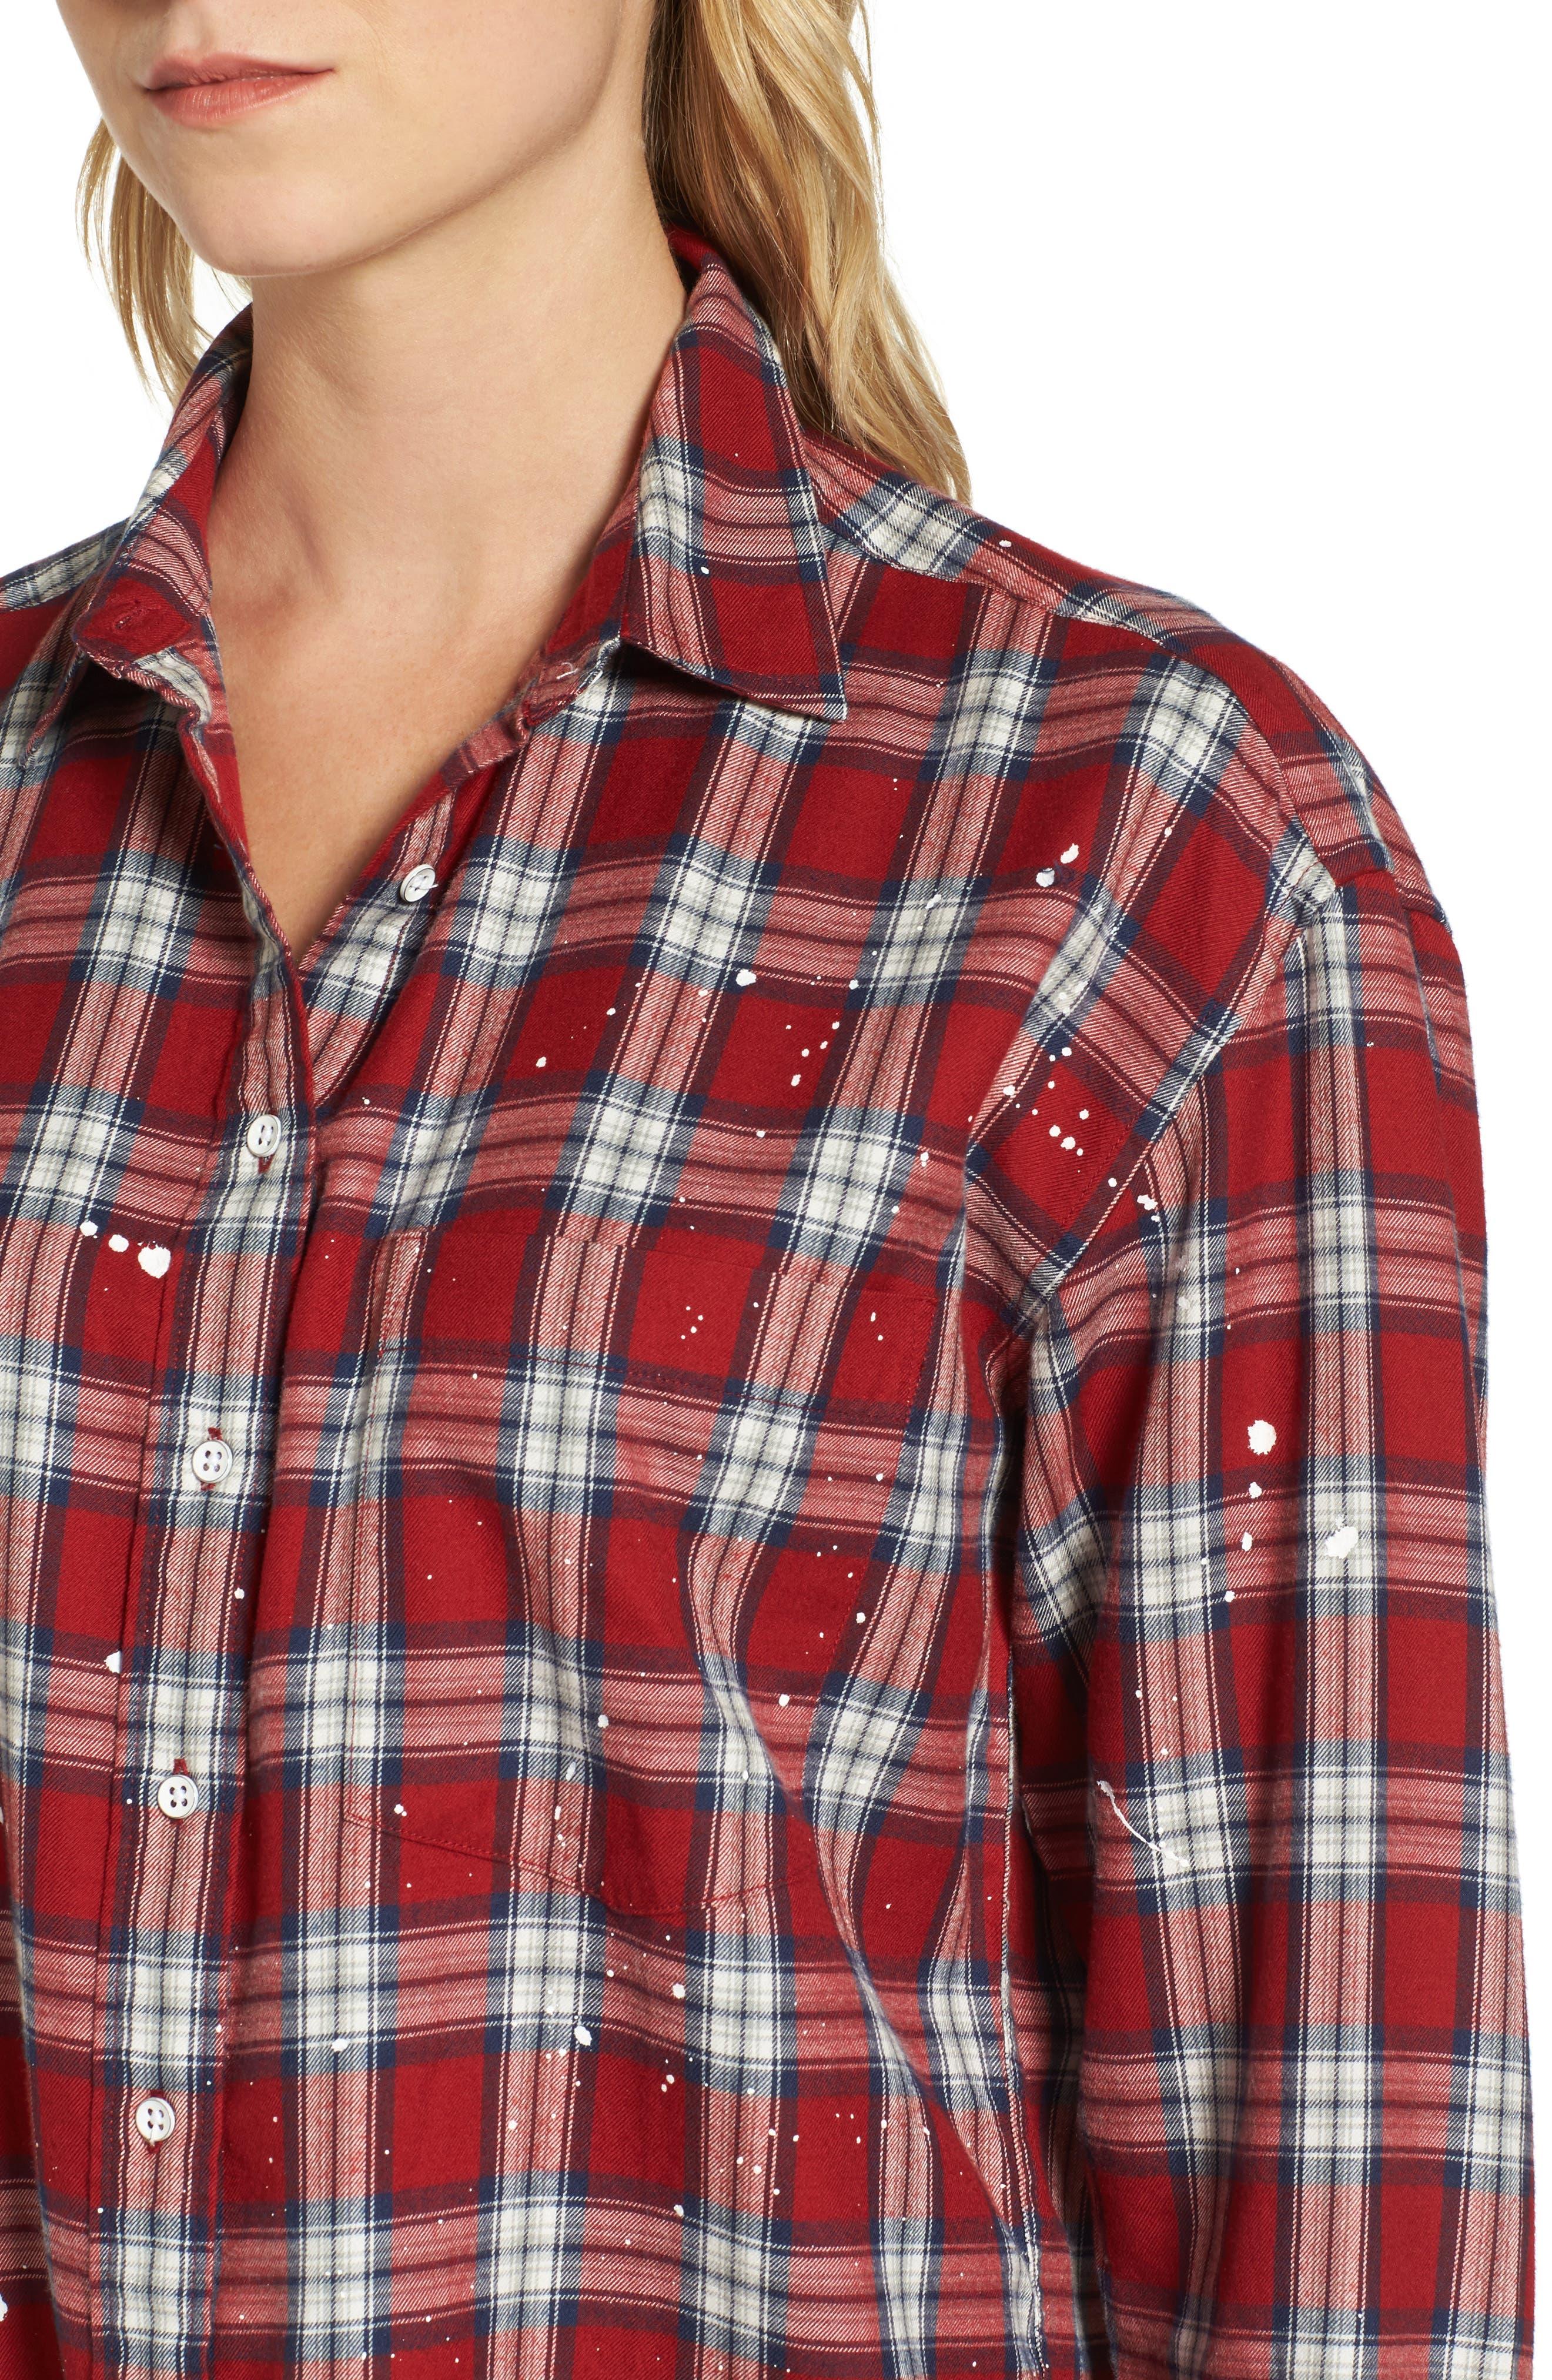 Rivington & Essex Plaid Shirtdress,                             Alternate thumbnail 4, color,                             609